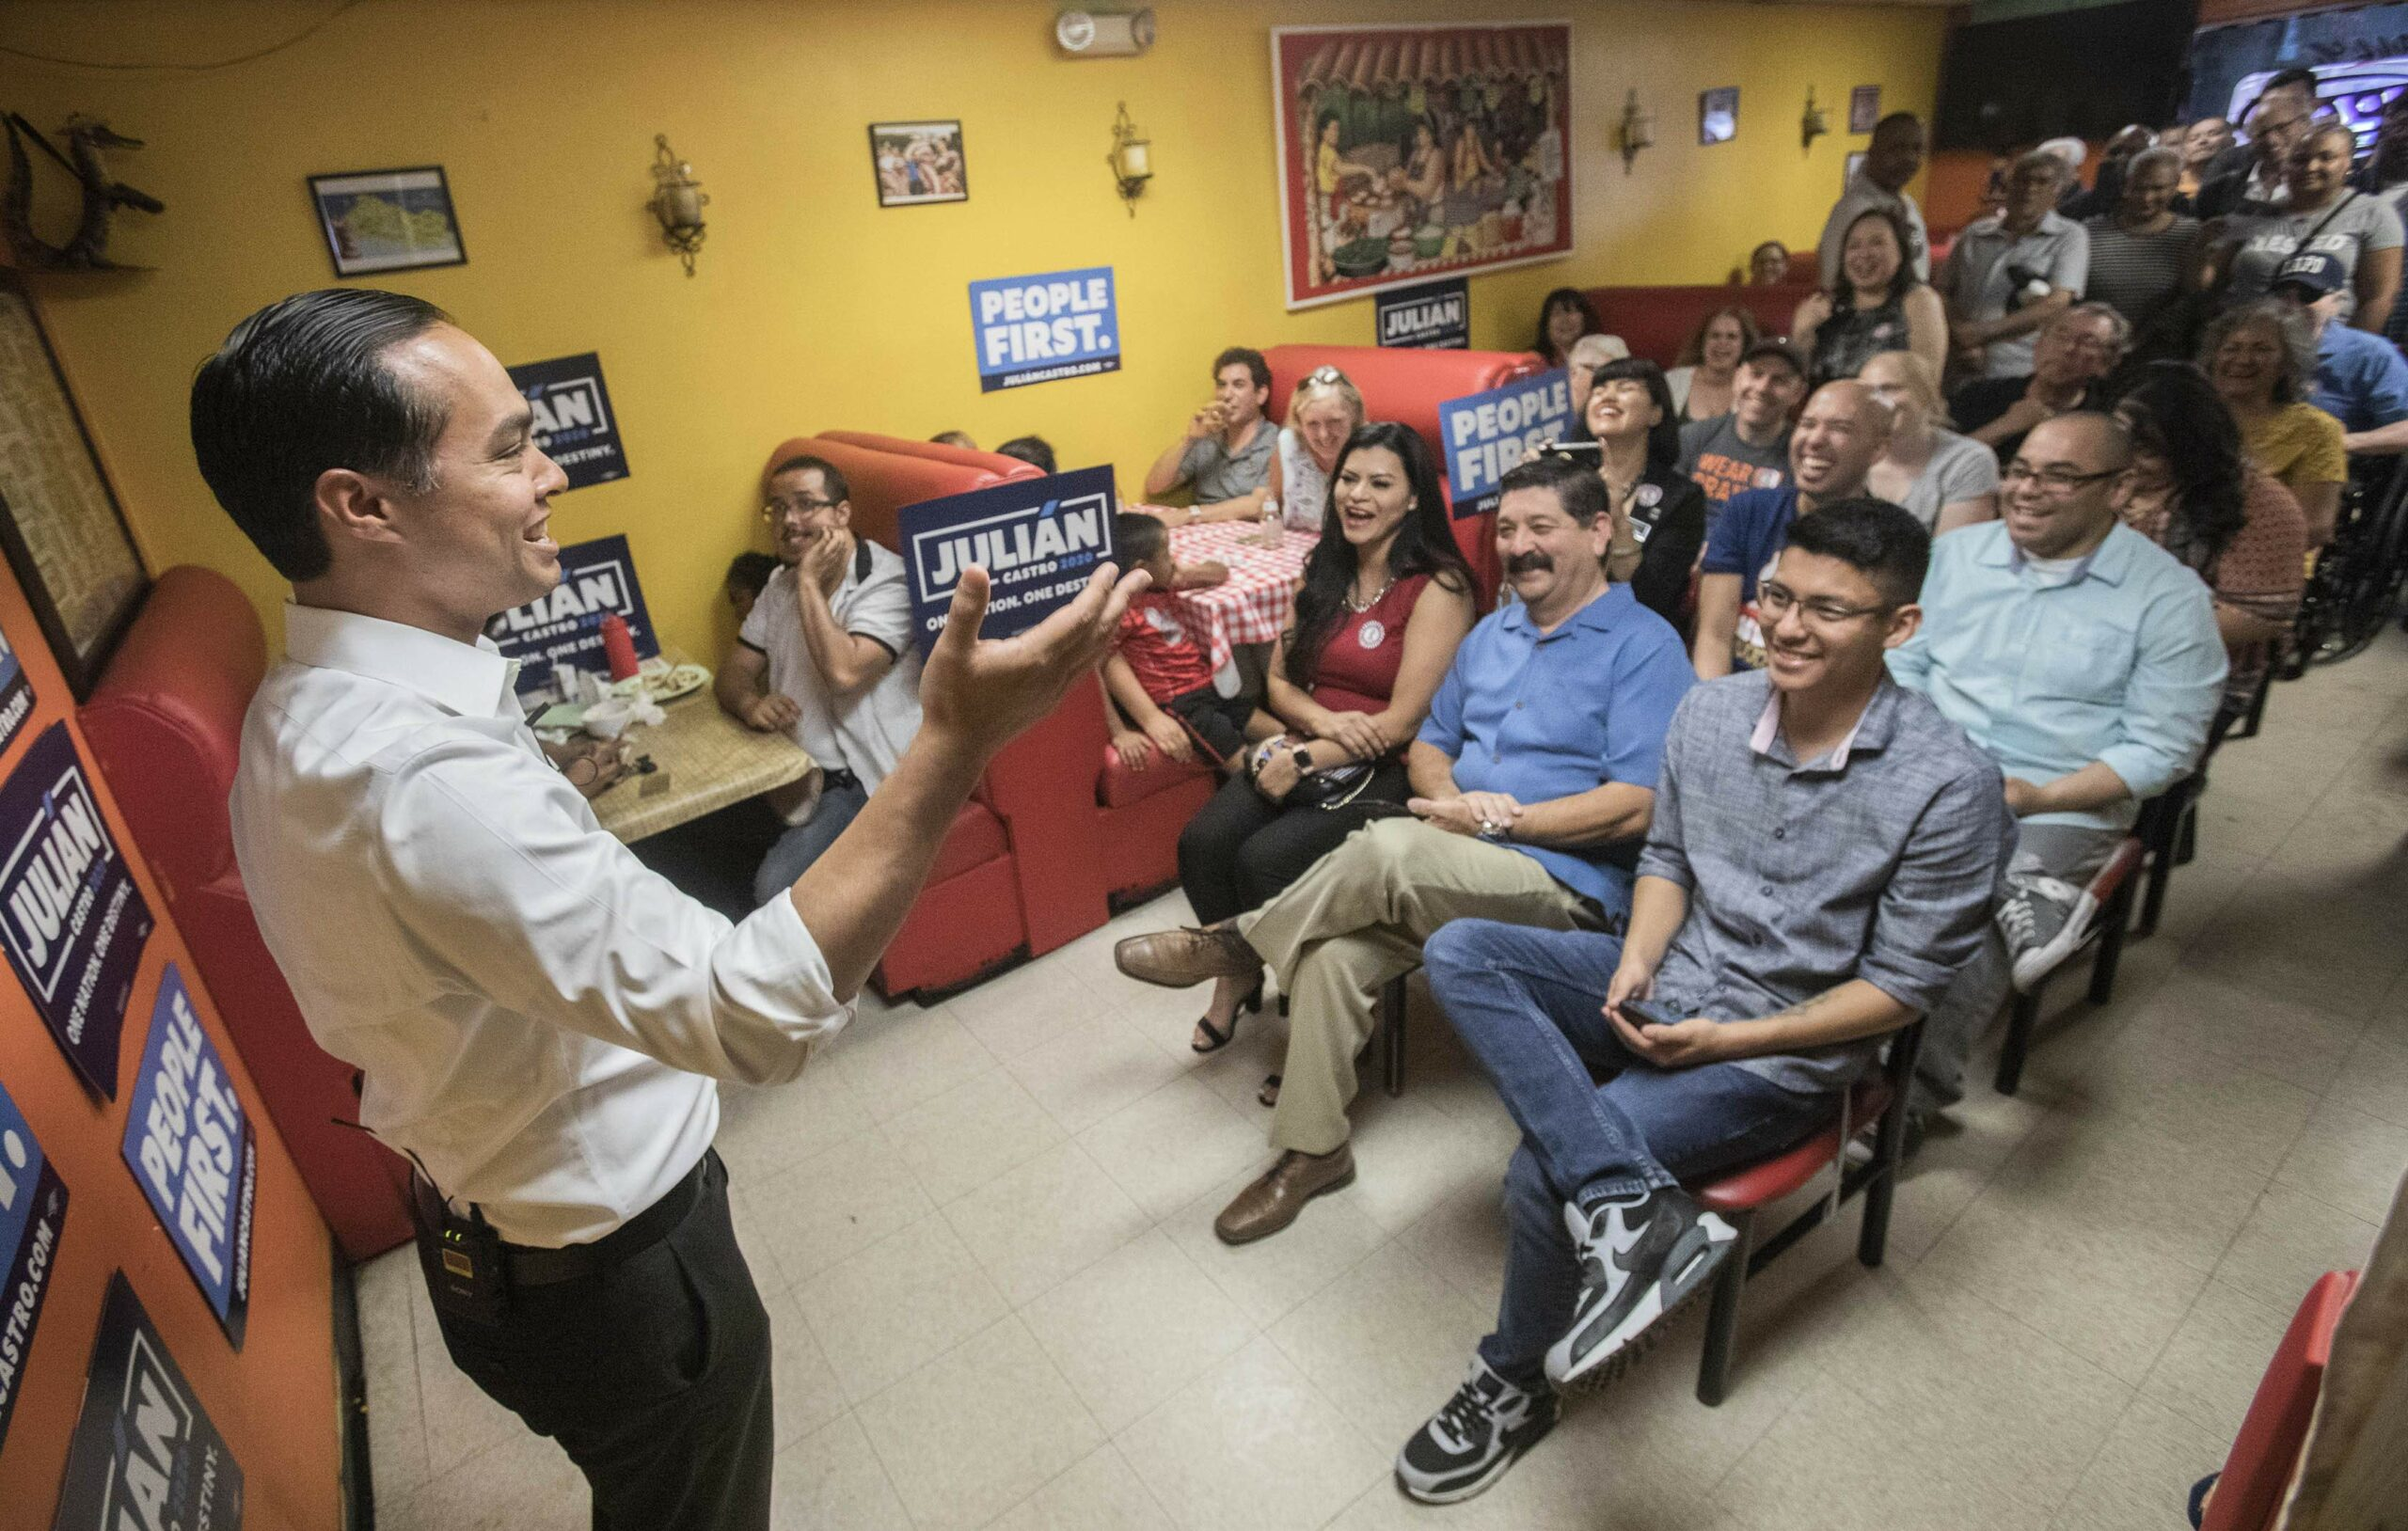 Presidential candidate Julian Castro, former secretary of Housing and Urban Development and mayor of San Antonio, Texas, speaks at San Salvador Restaurant